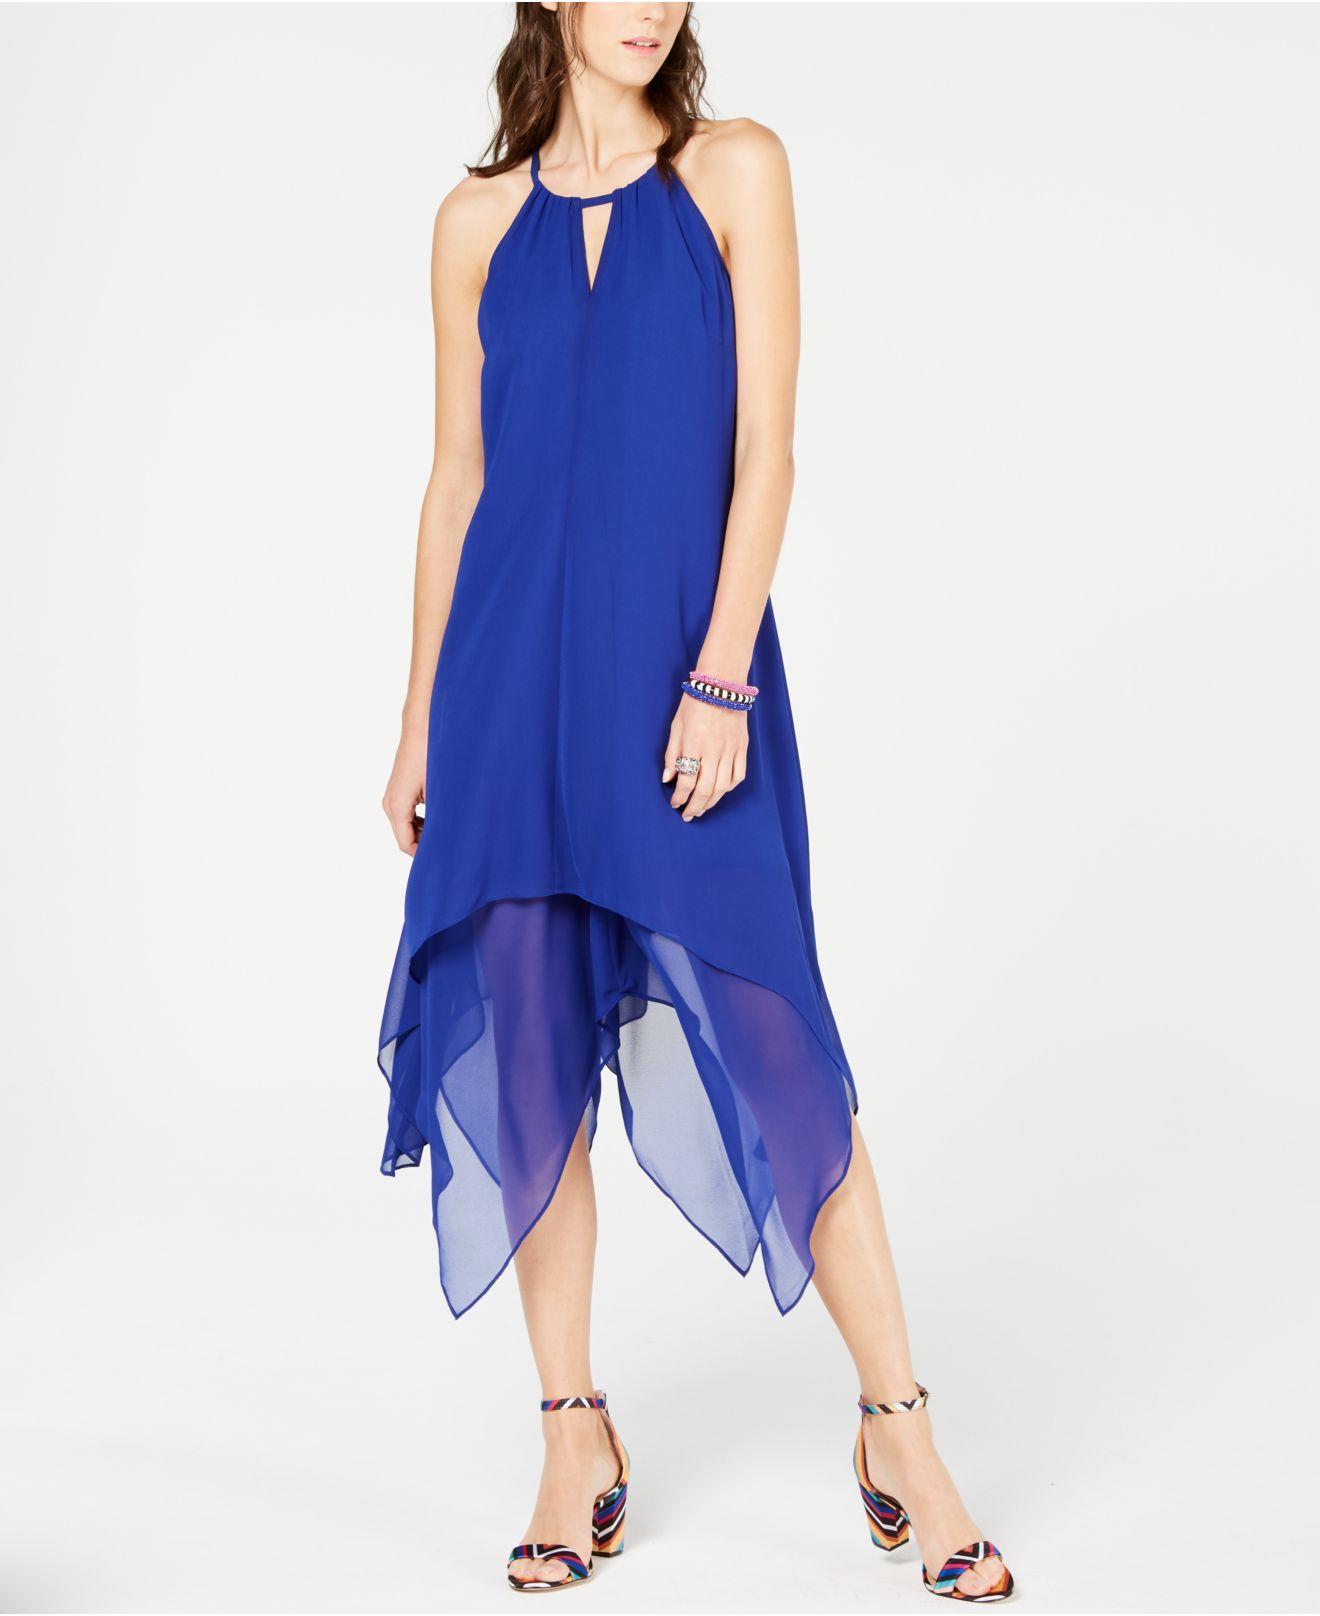 9369c7563db19 INC International Concepts. Women's Blue I.n.c. Handkerchief-hem Dress ...